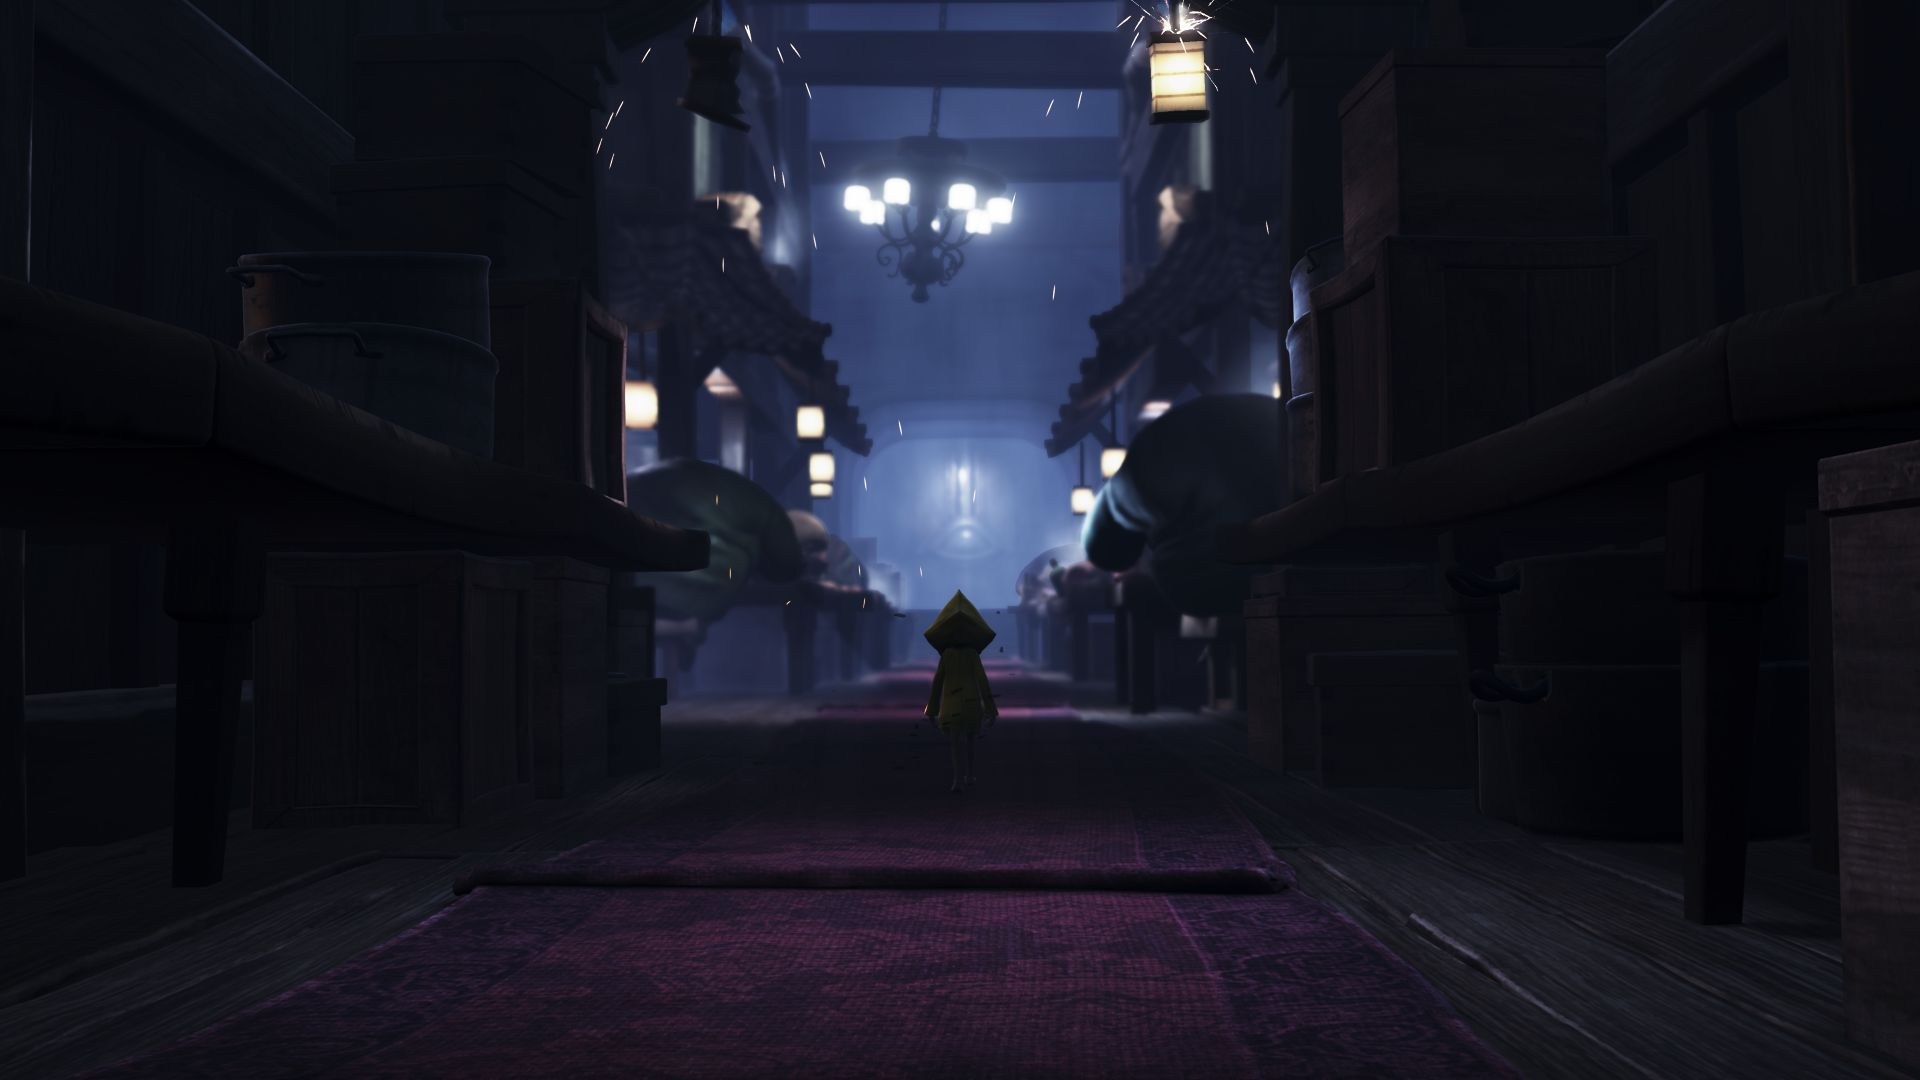 Little Nightmares, game, dark, street